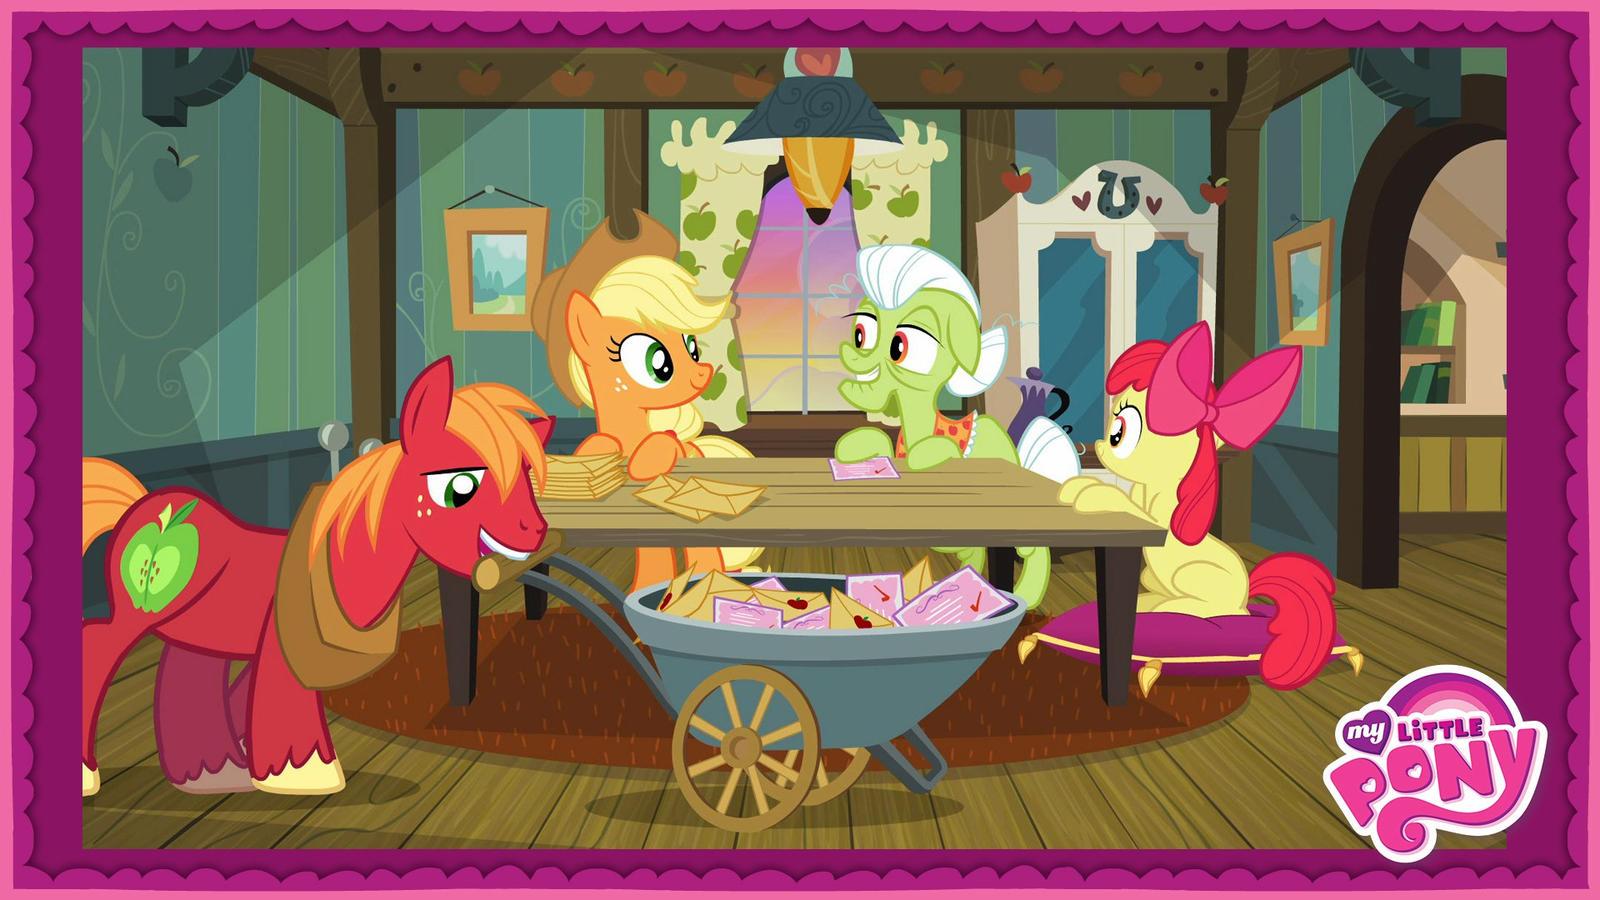 My Little Pony FiM Season 3 - Apple Family Reunion by GT4tube